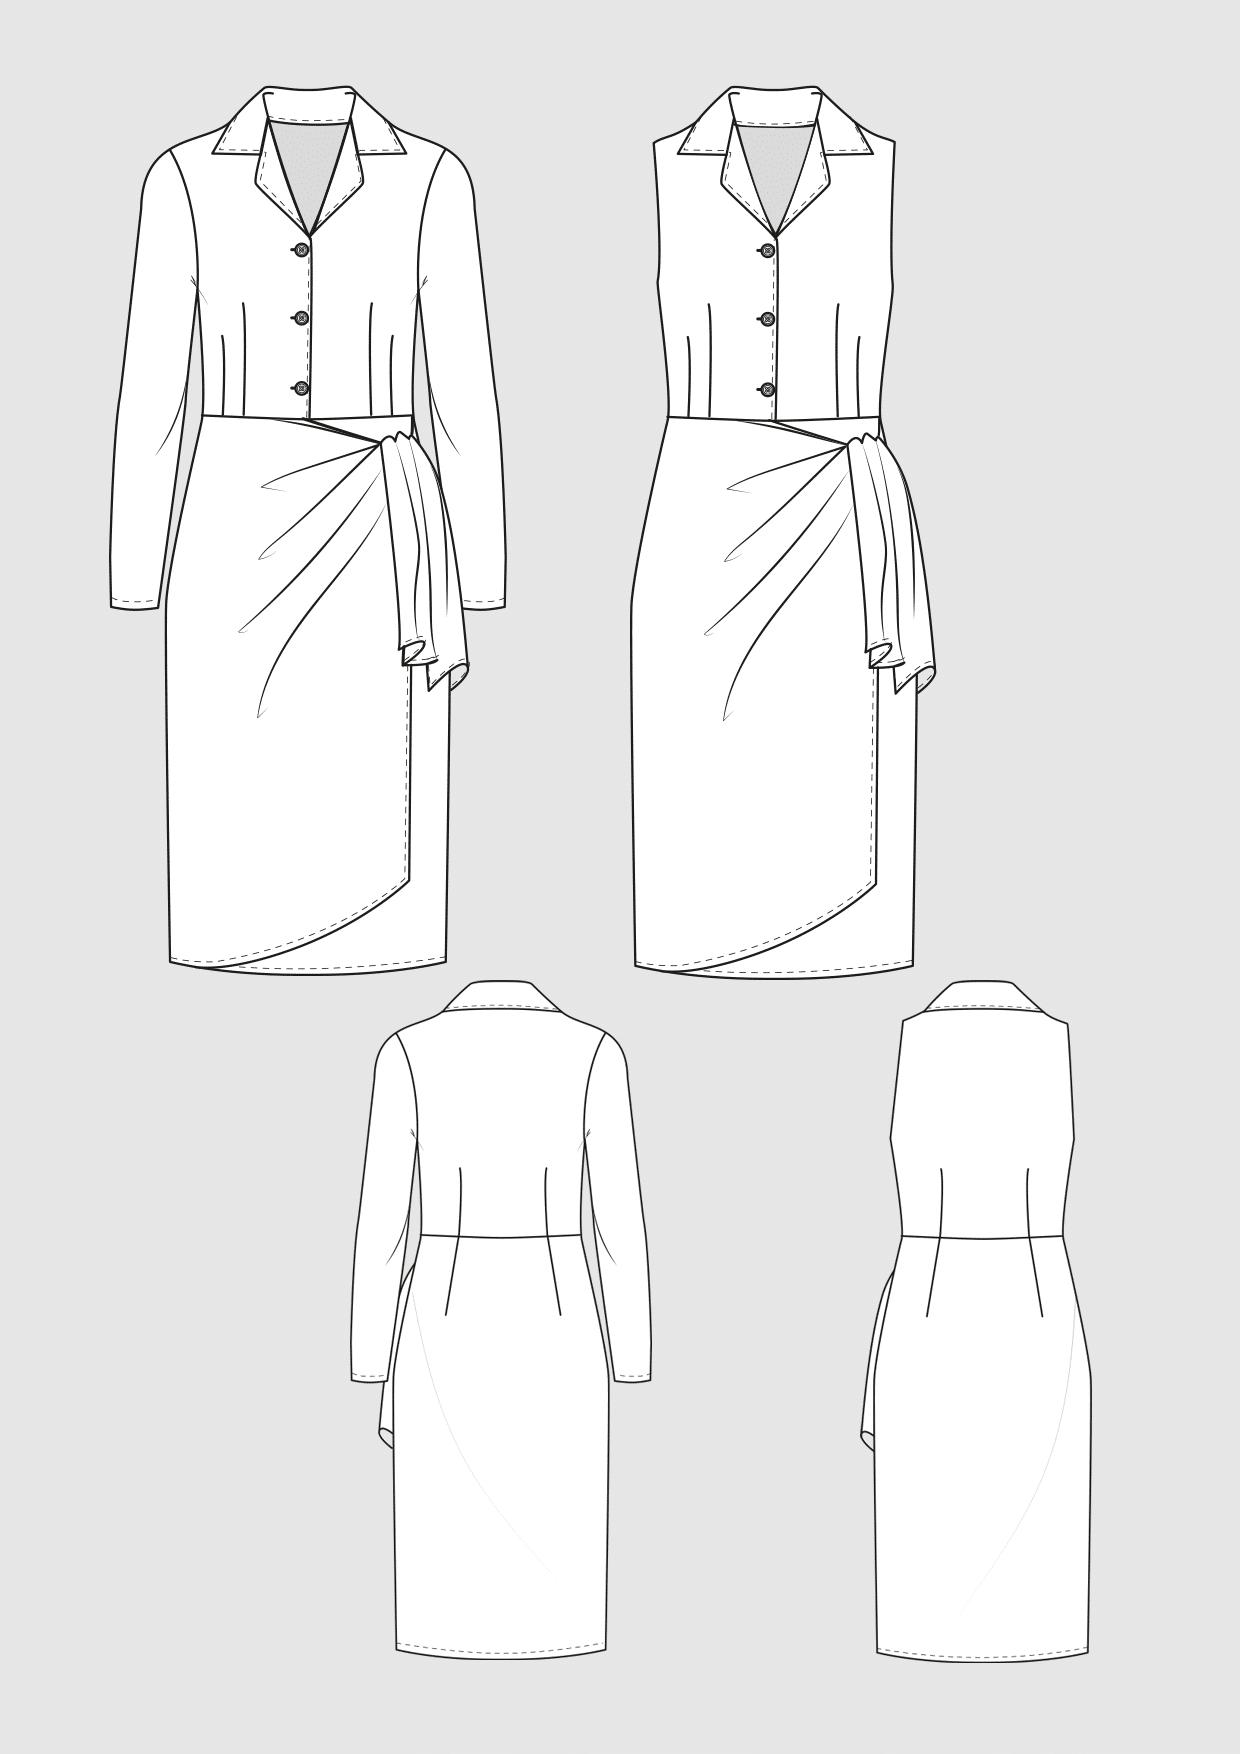 Produkt: Schnittmuster Hemdblusenkleid in Wickeloptik